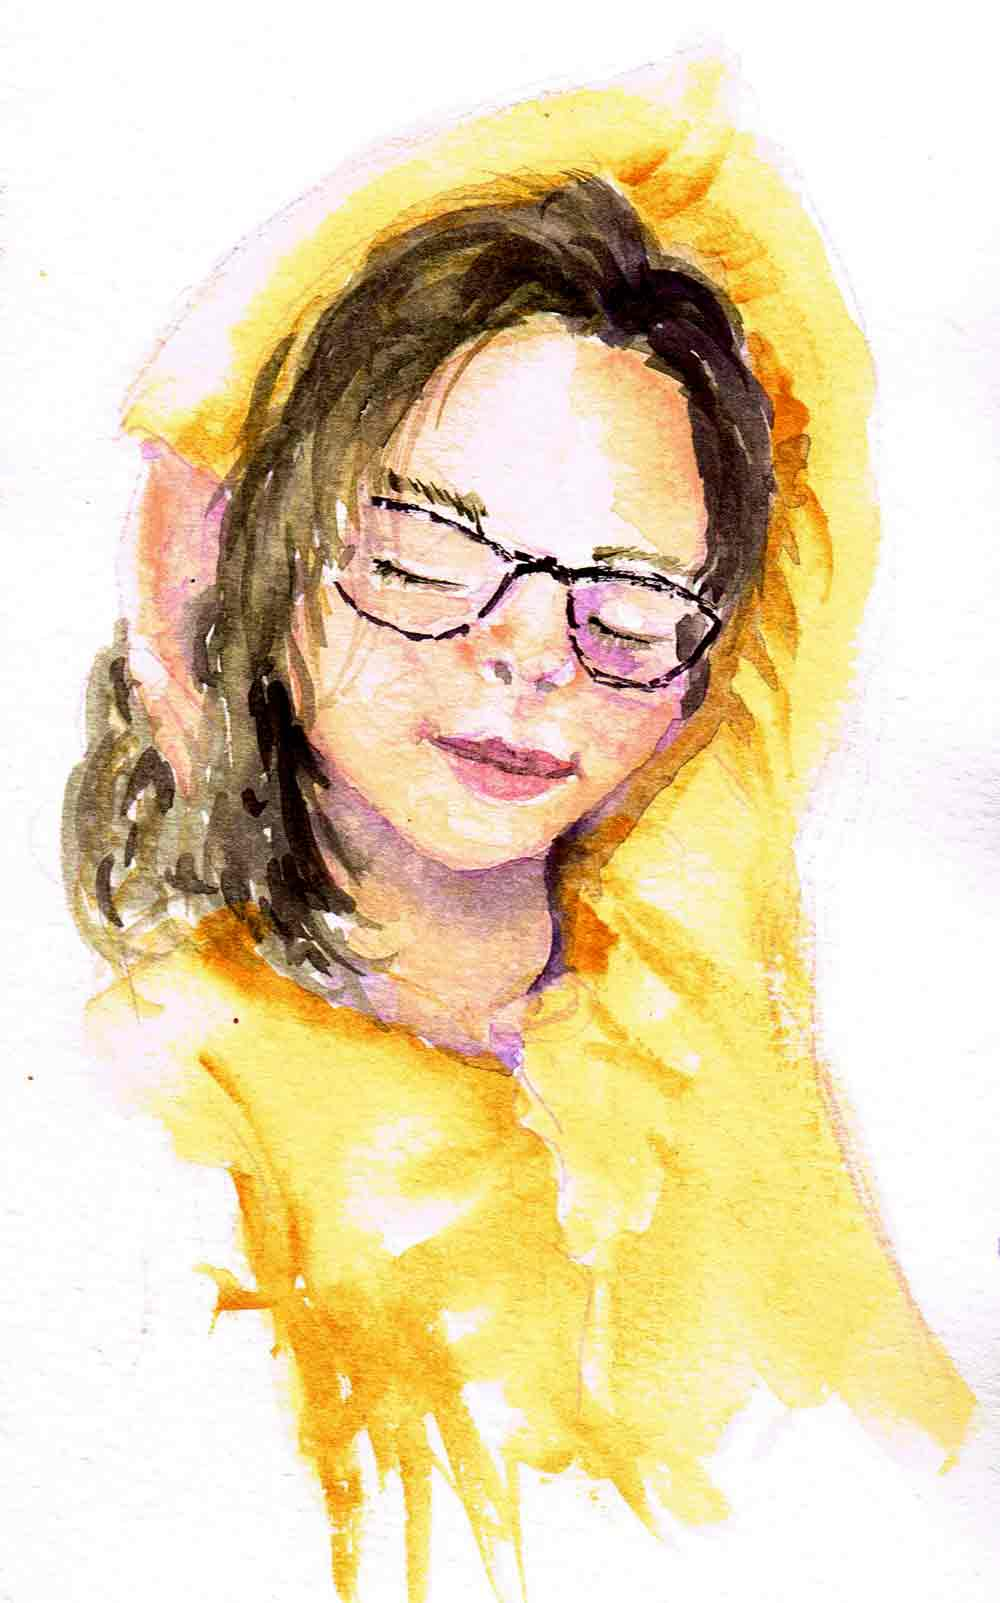 "Watercolour portraits no 3 - Thoughtful Rest (Watercolour sketchbook 5""x 8"")"